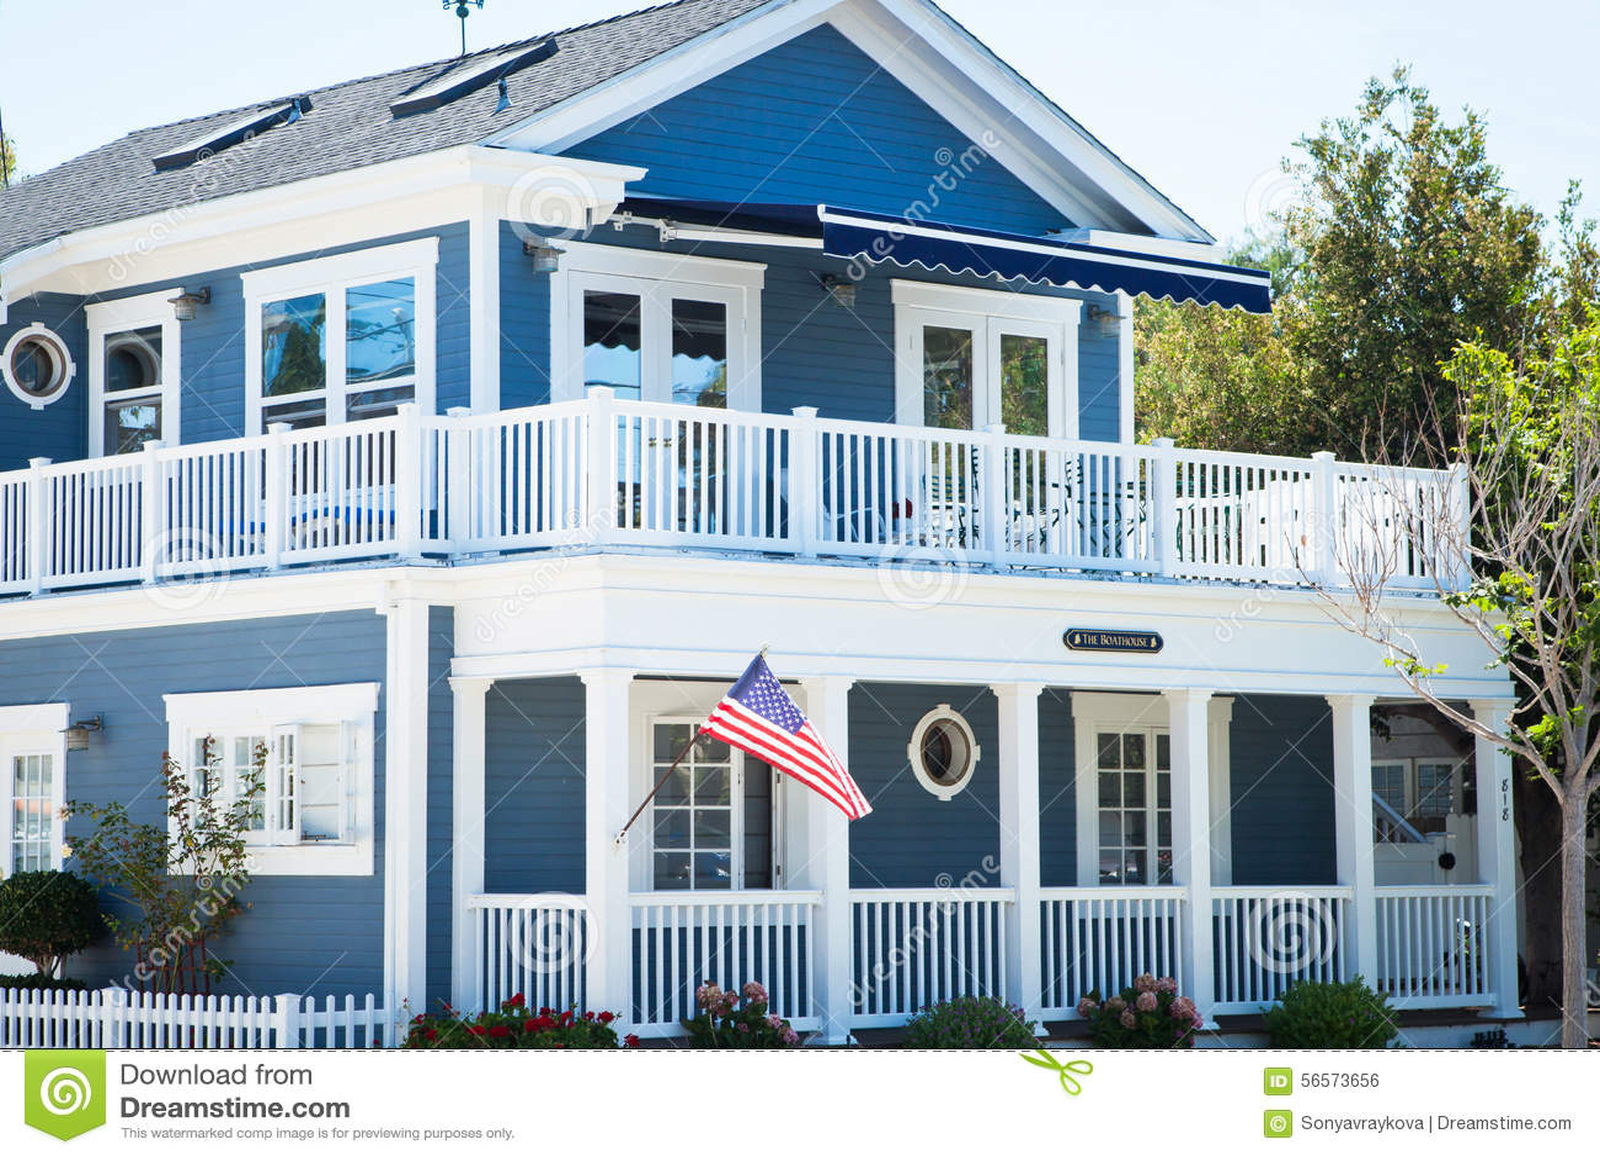 Blue Boat House - Coronado, San Diego USA Stock Photo - Image: 56573656